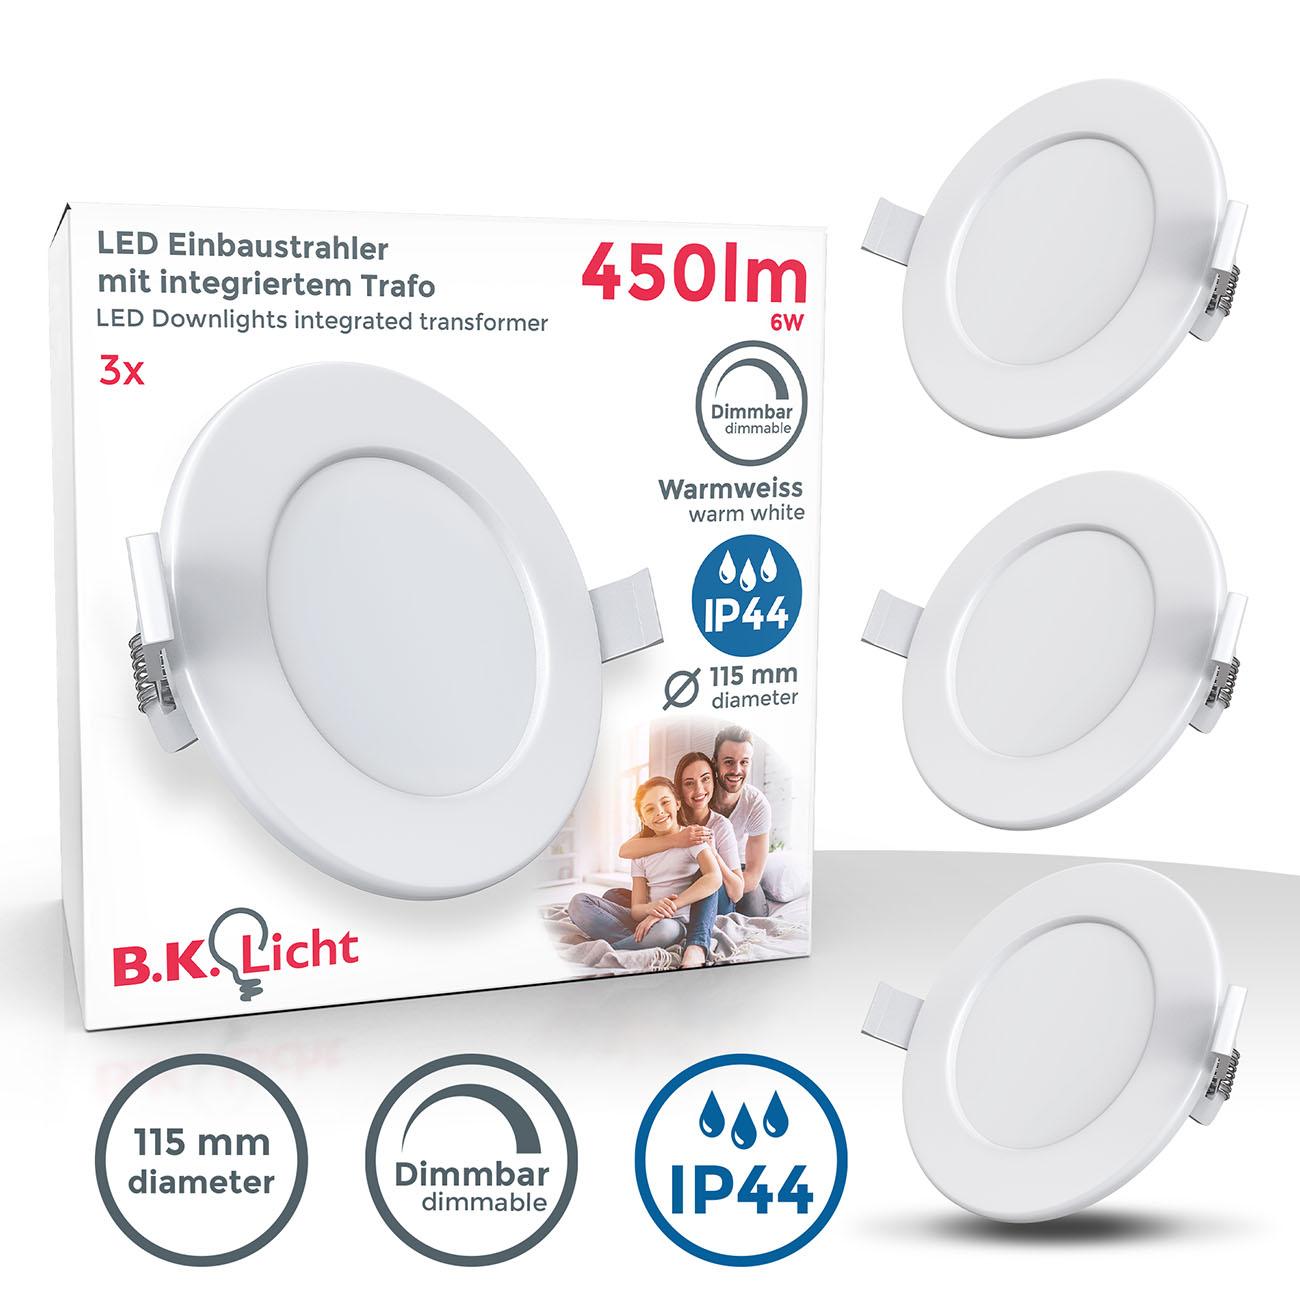 LED Einbaustrahler | Bad Einbauleuchte 3er SET | ultra flach 6W IP44 dimmbar